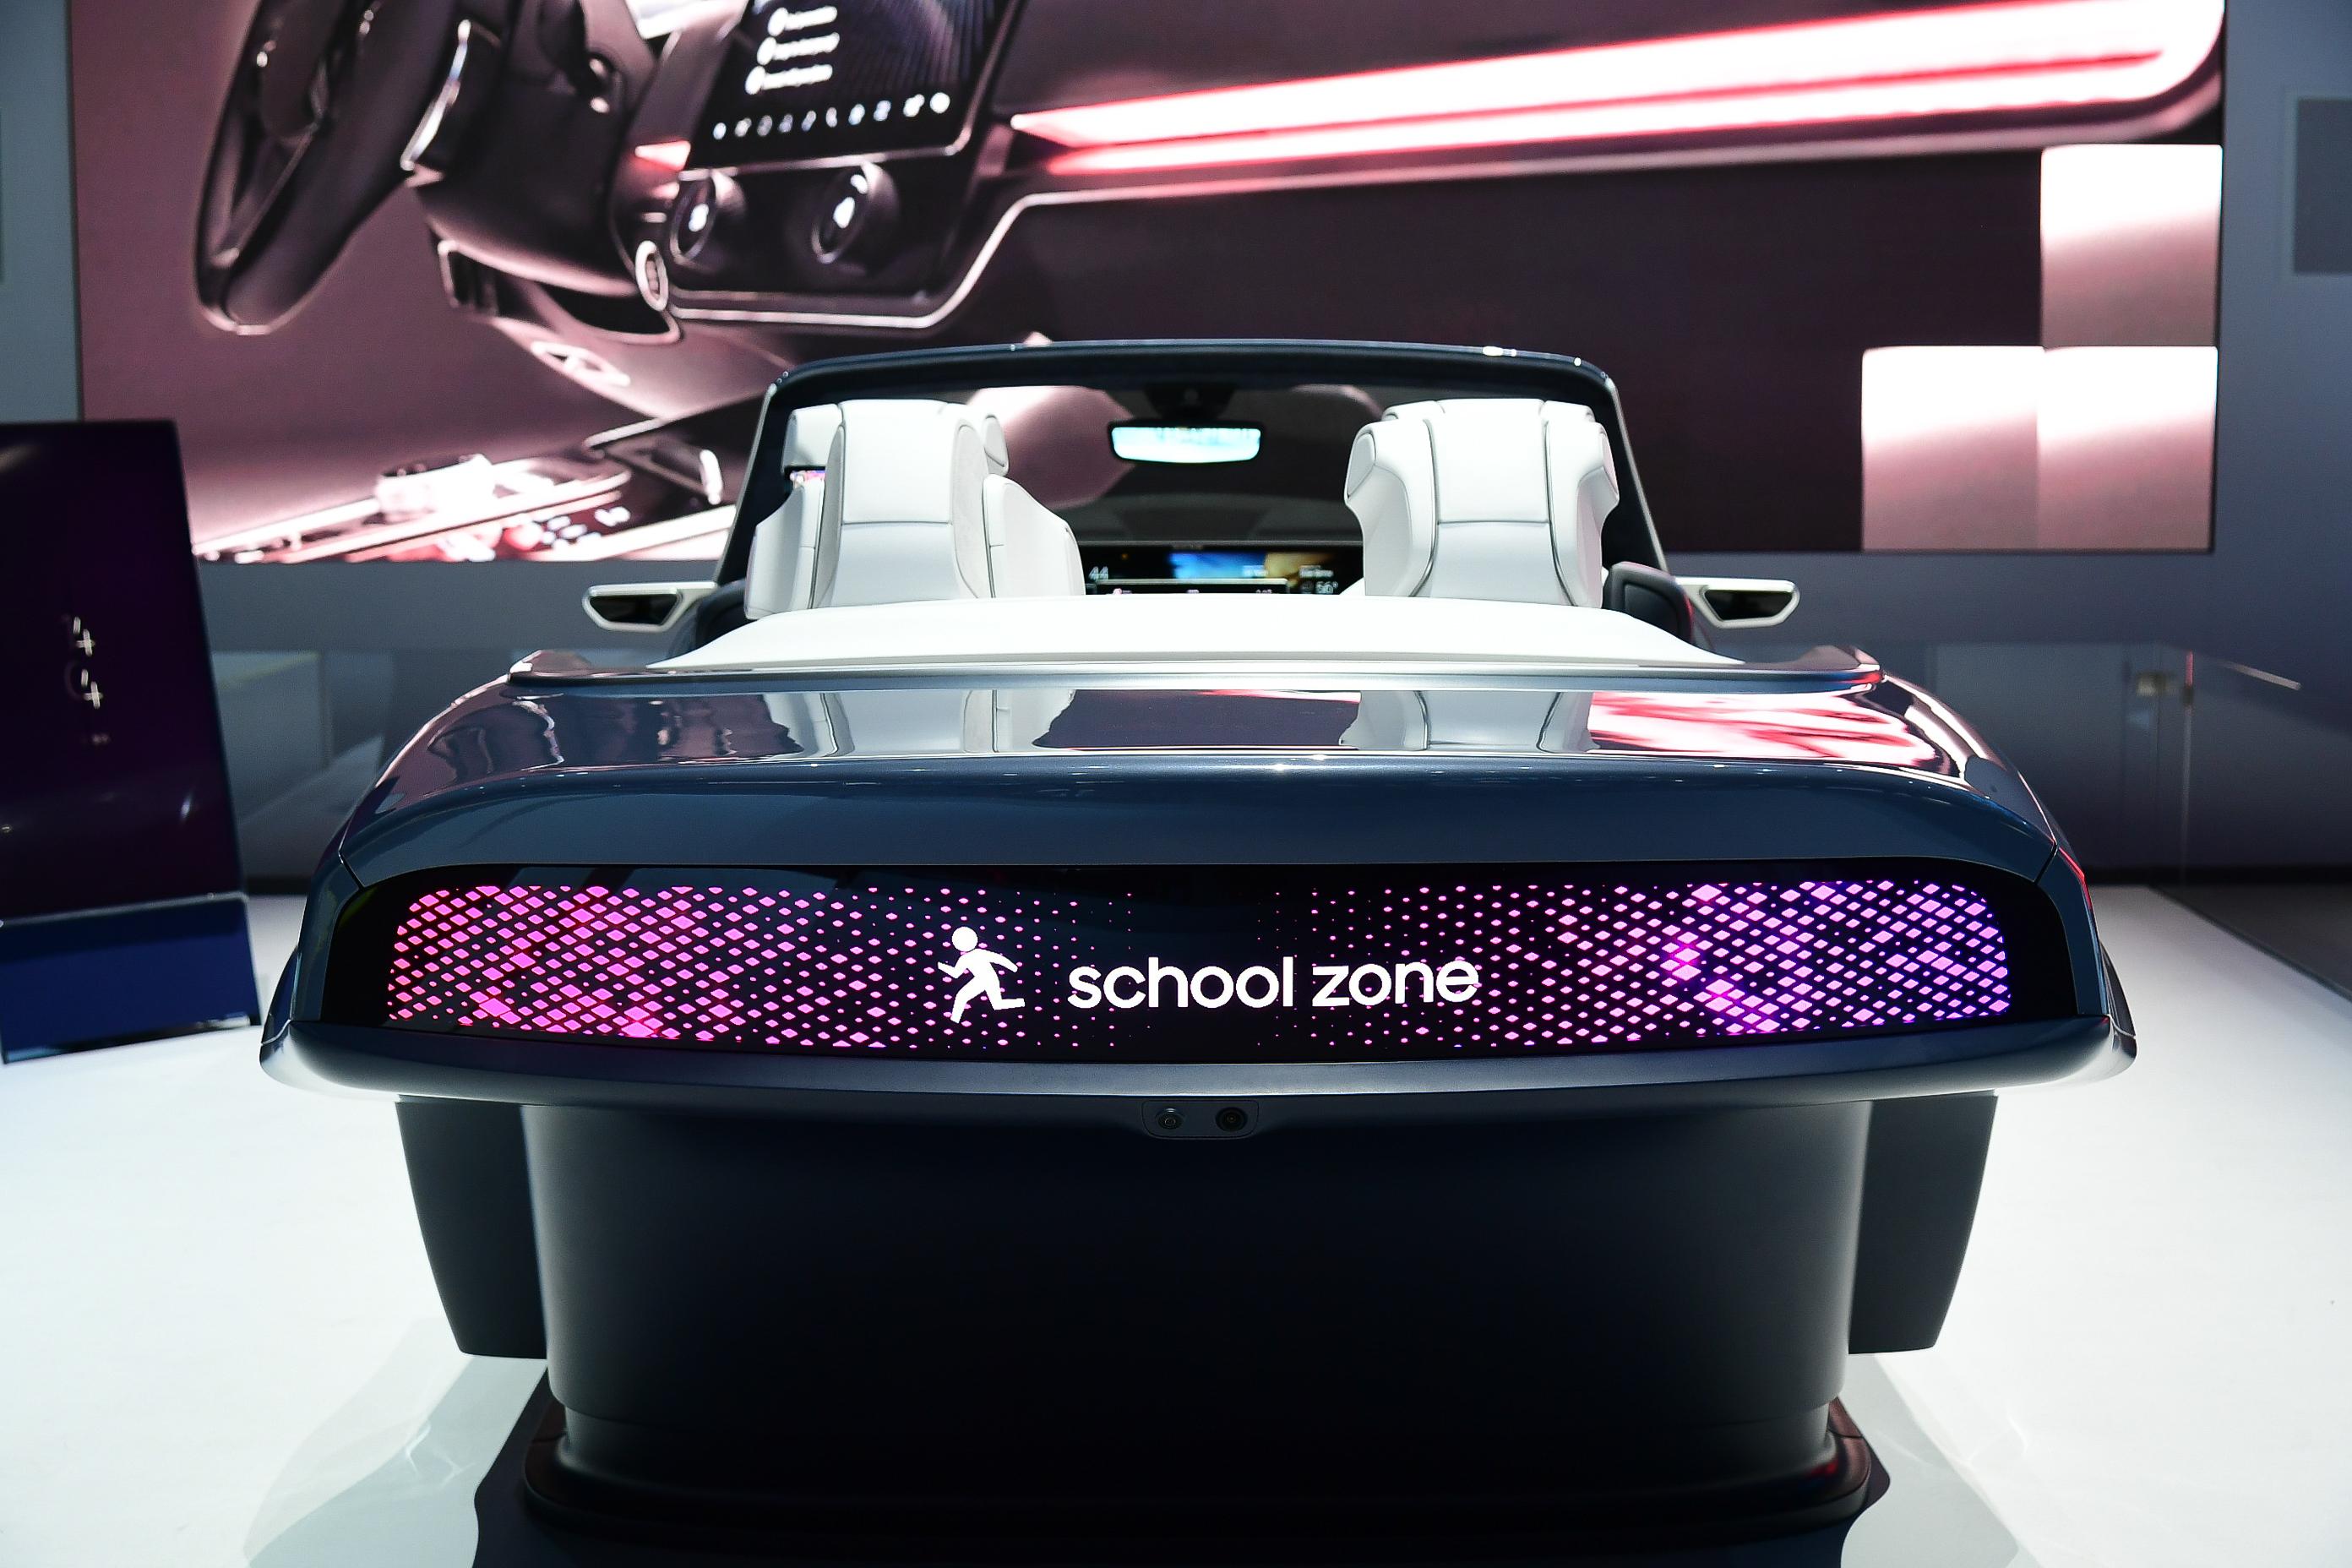 5G Connected Car - CES 2020